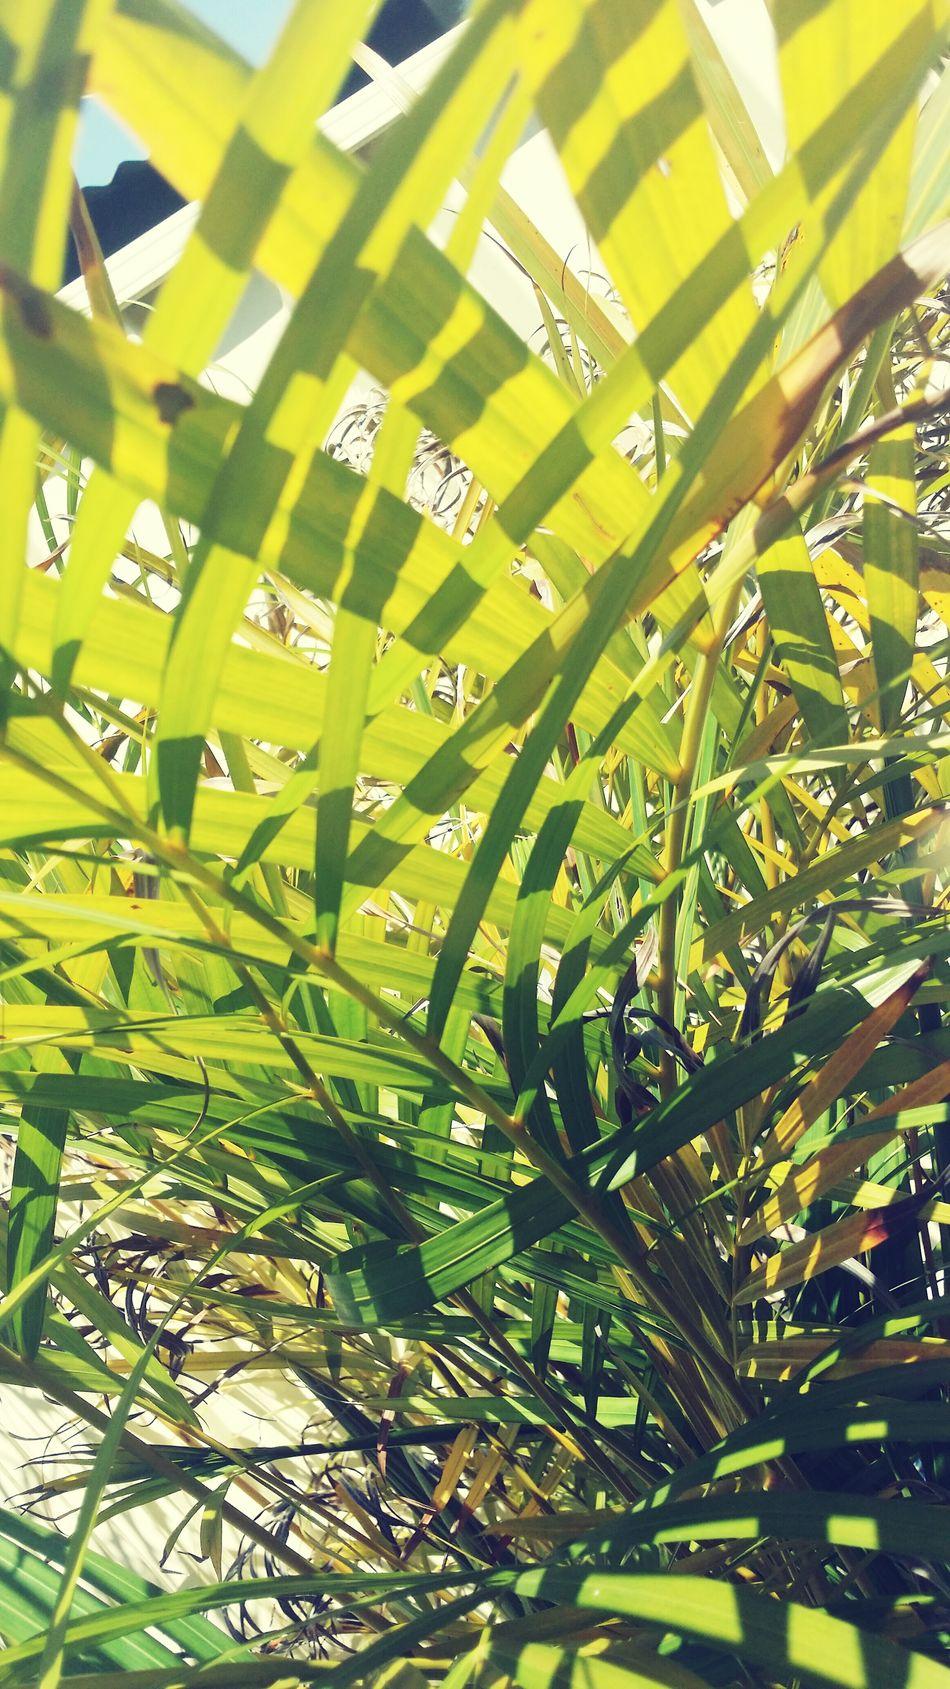 FERN ANYBODY? Summer2015 Beauitful Day Treehugger Sydney, Australia Tweettweet